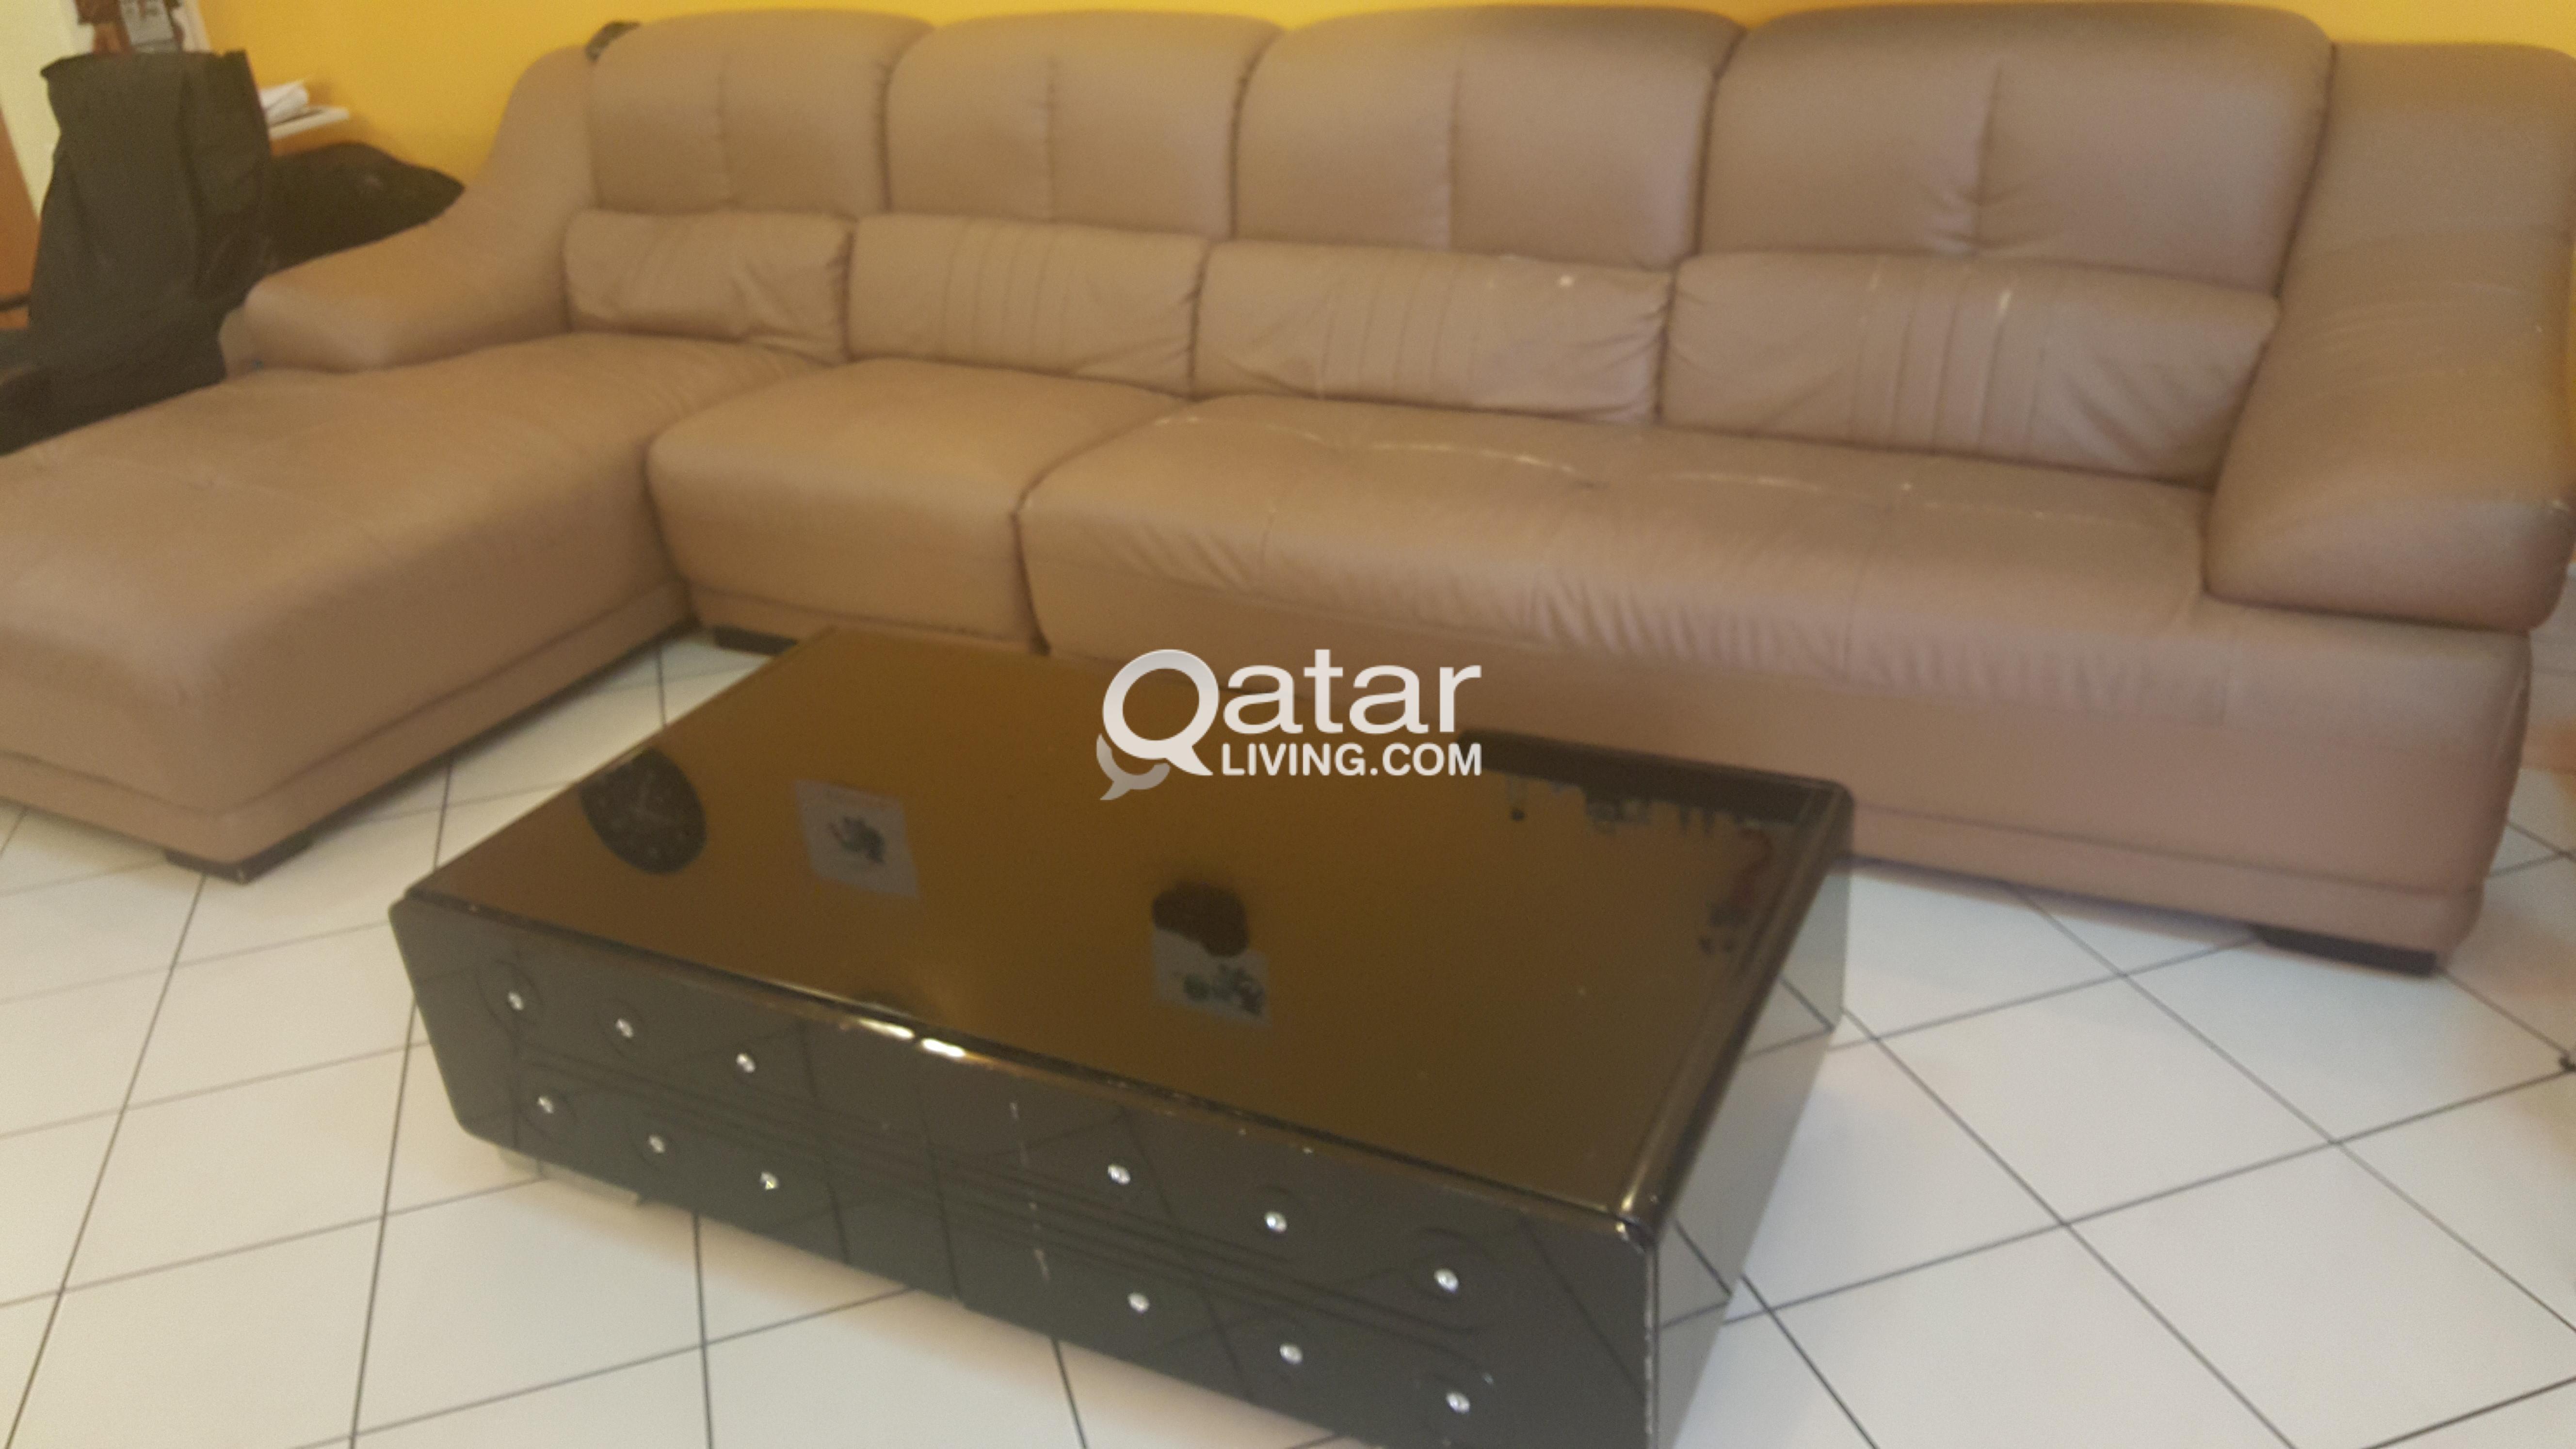 clearance sale-corner sofa bed(4+1)+center table | qatar living